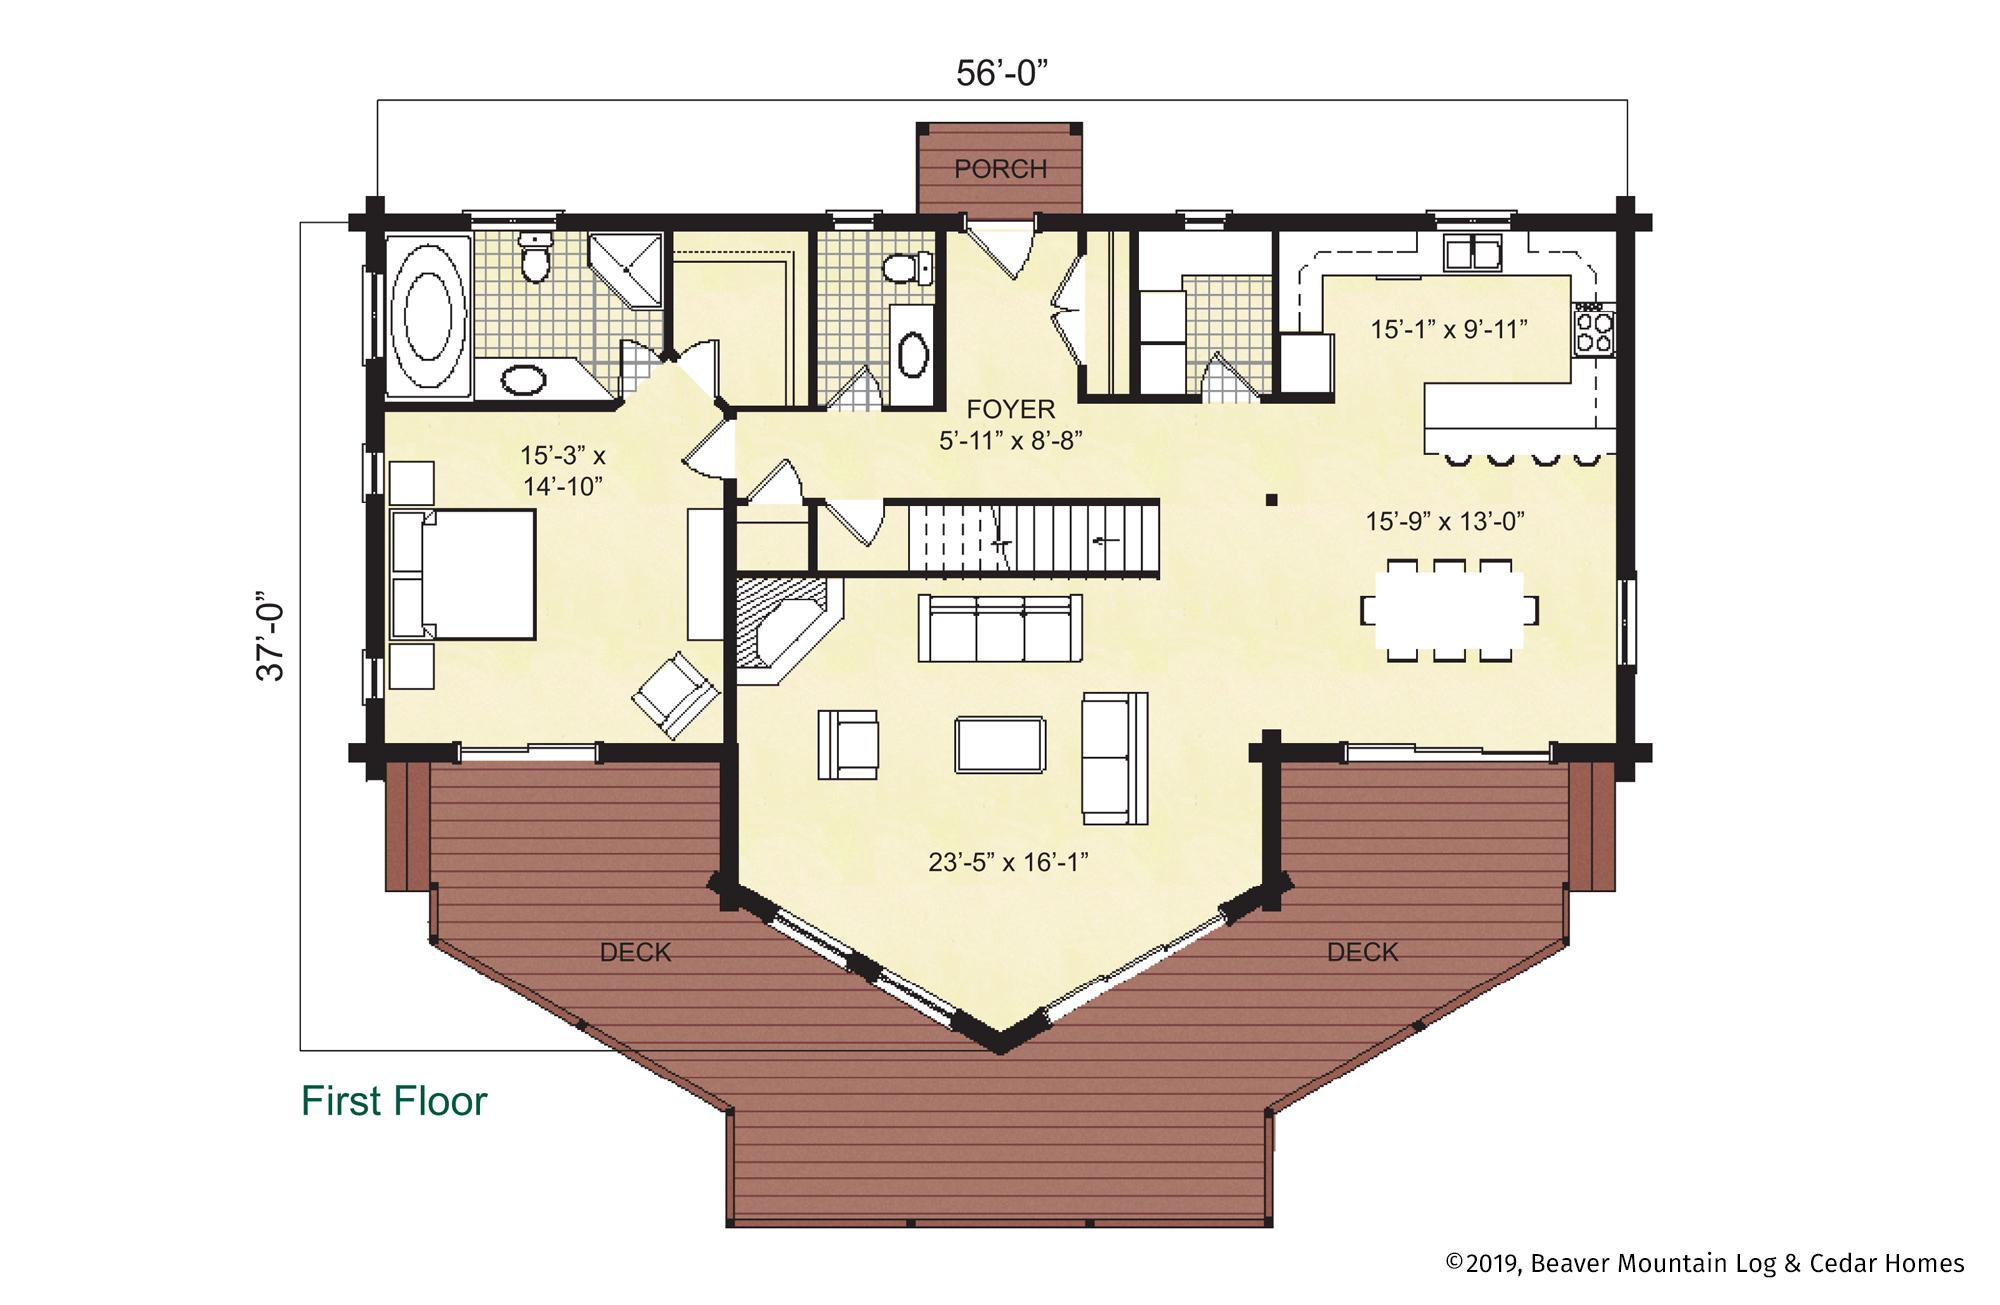 Beaver Mountain Log Homes Ouaquaga Main Level Floor Plan